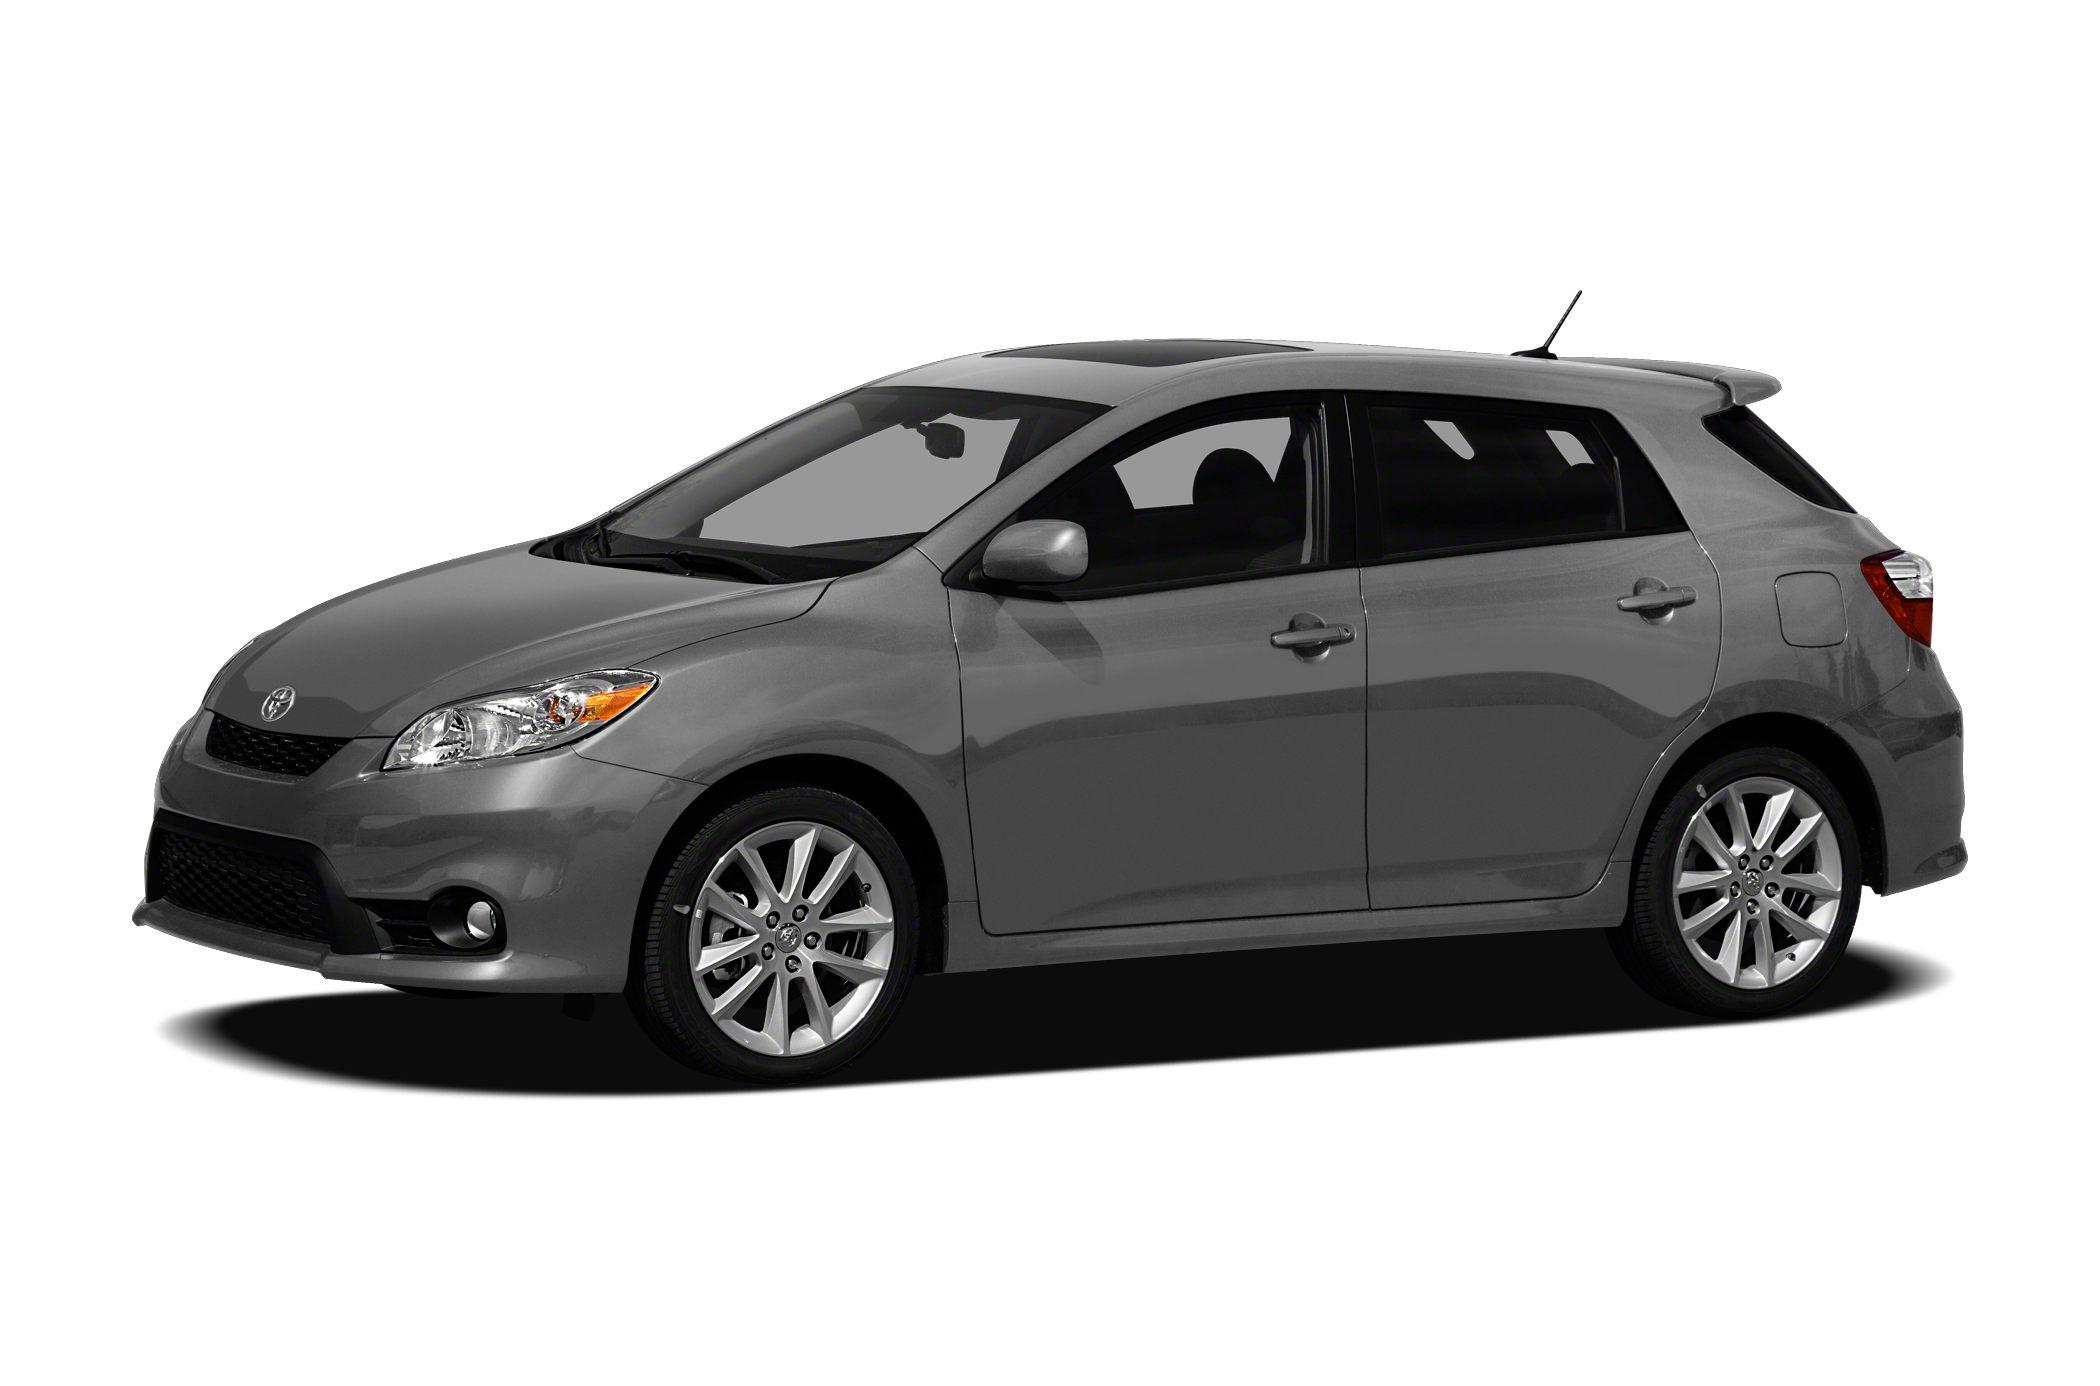 2011 Toyota Matrix Base Hatchback for sale in Arlington for $11,879 with 75,150 miles